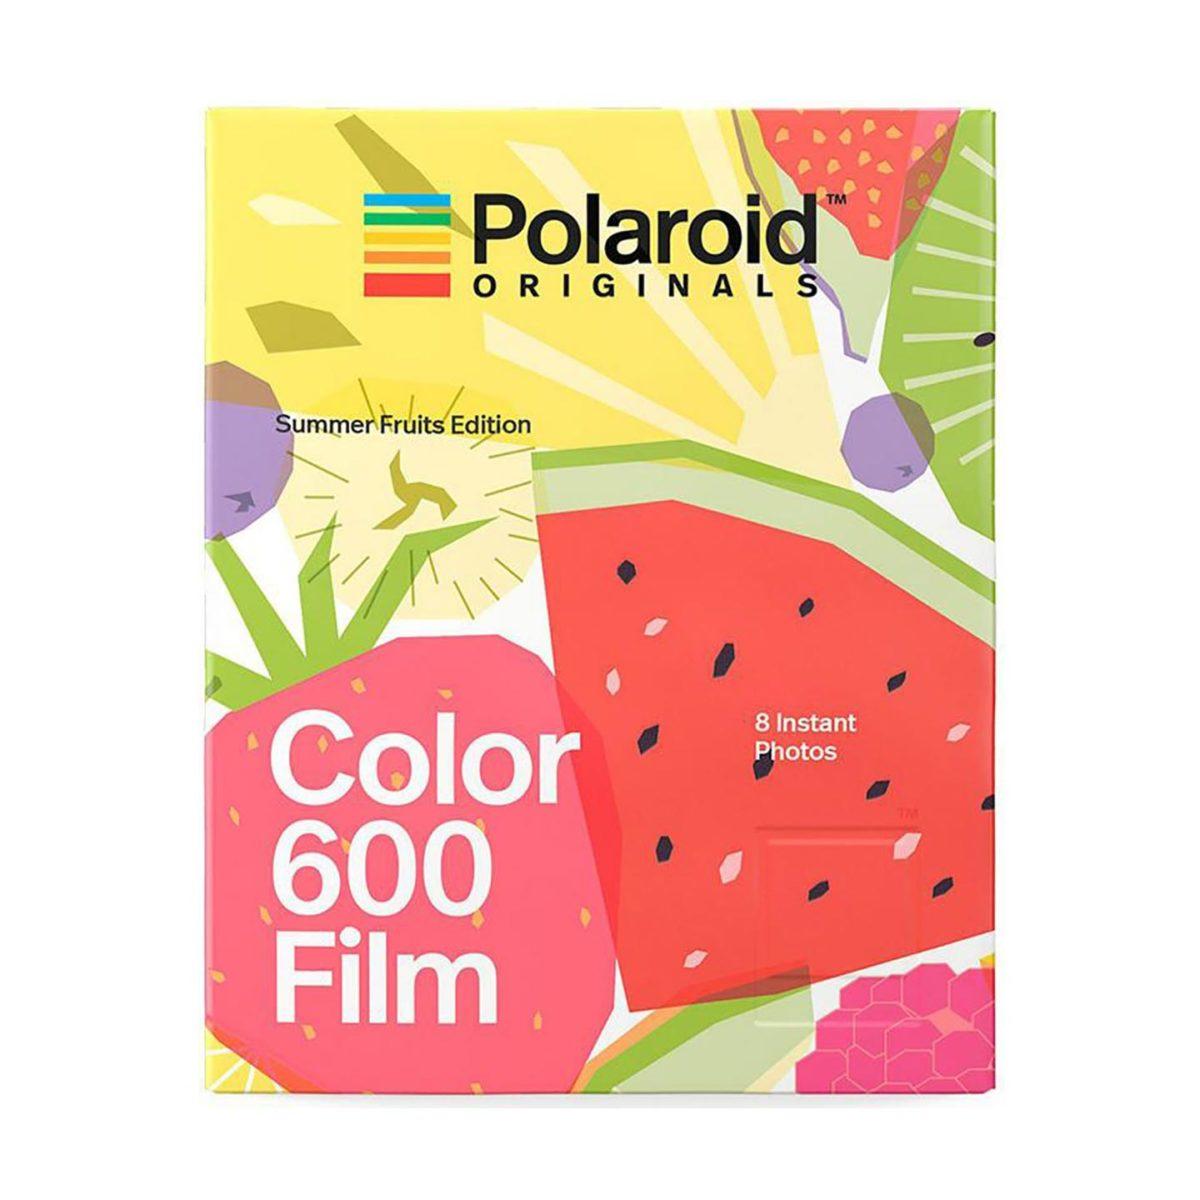 polaroid_600_color_film_summer_fruits_02